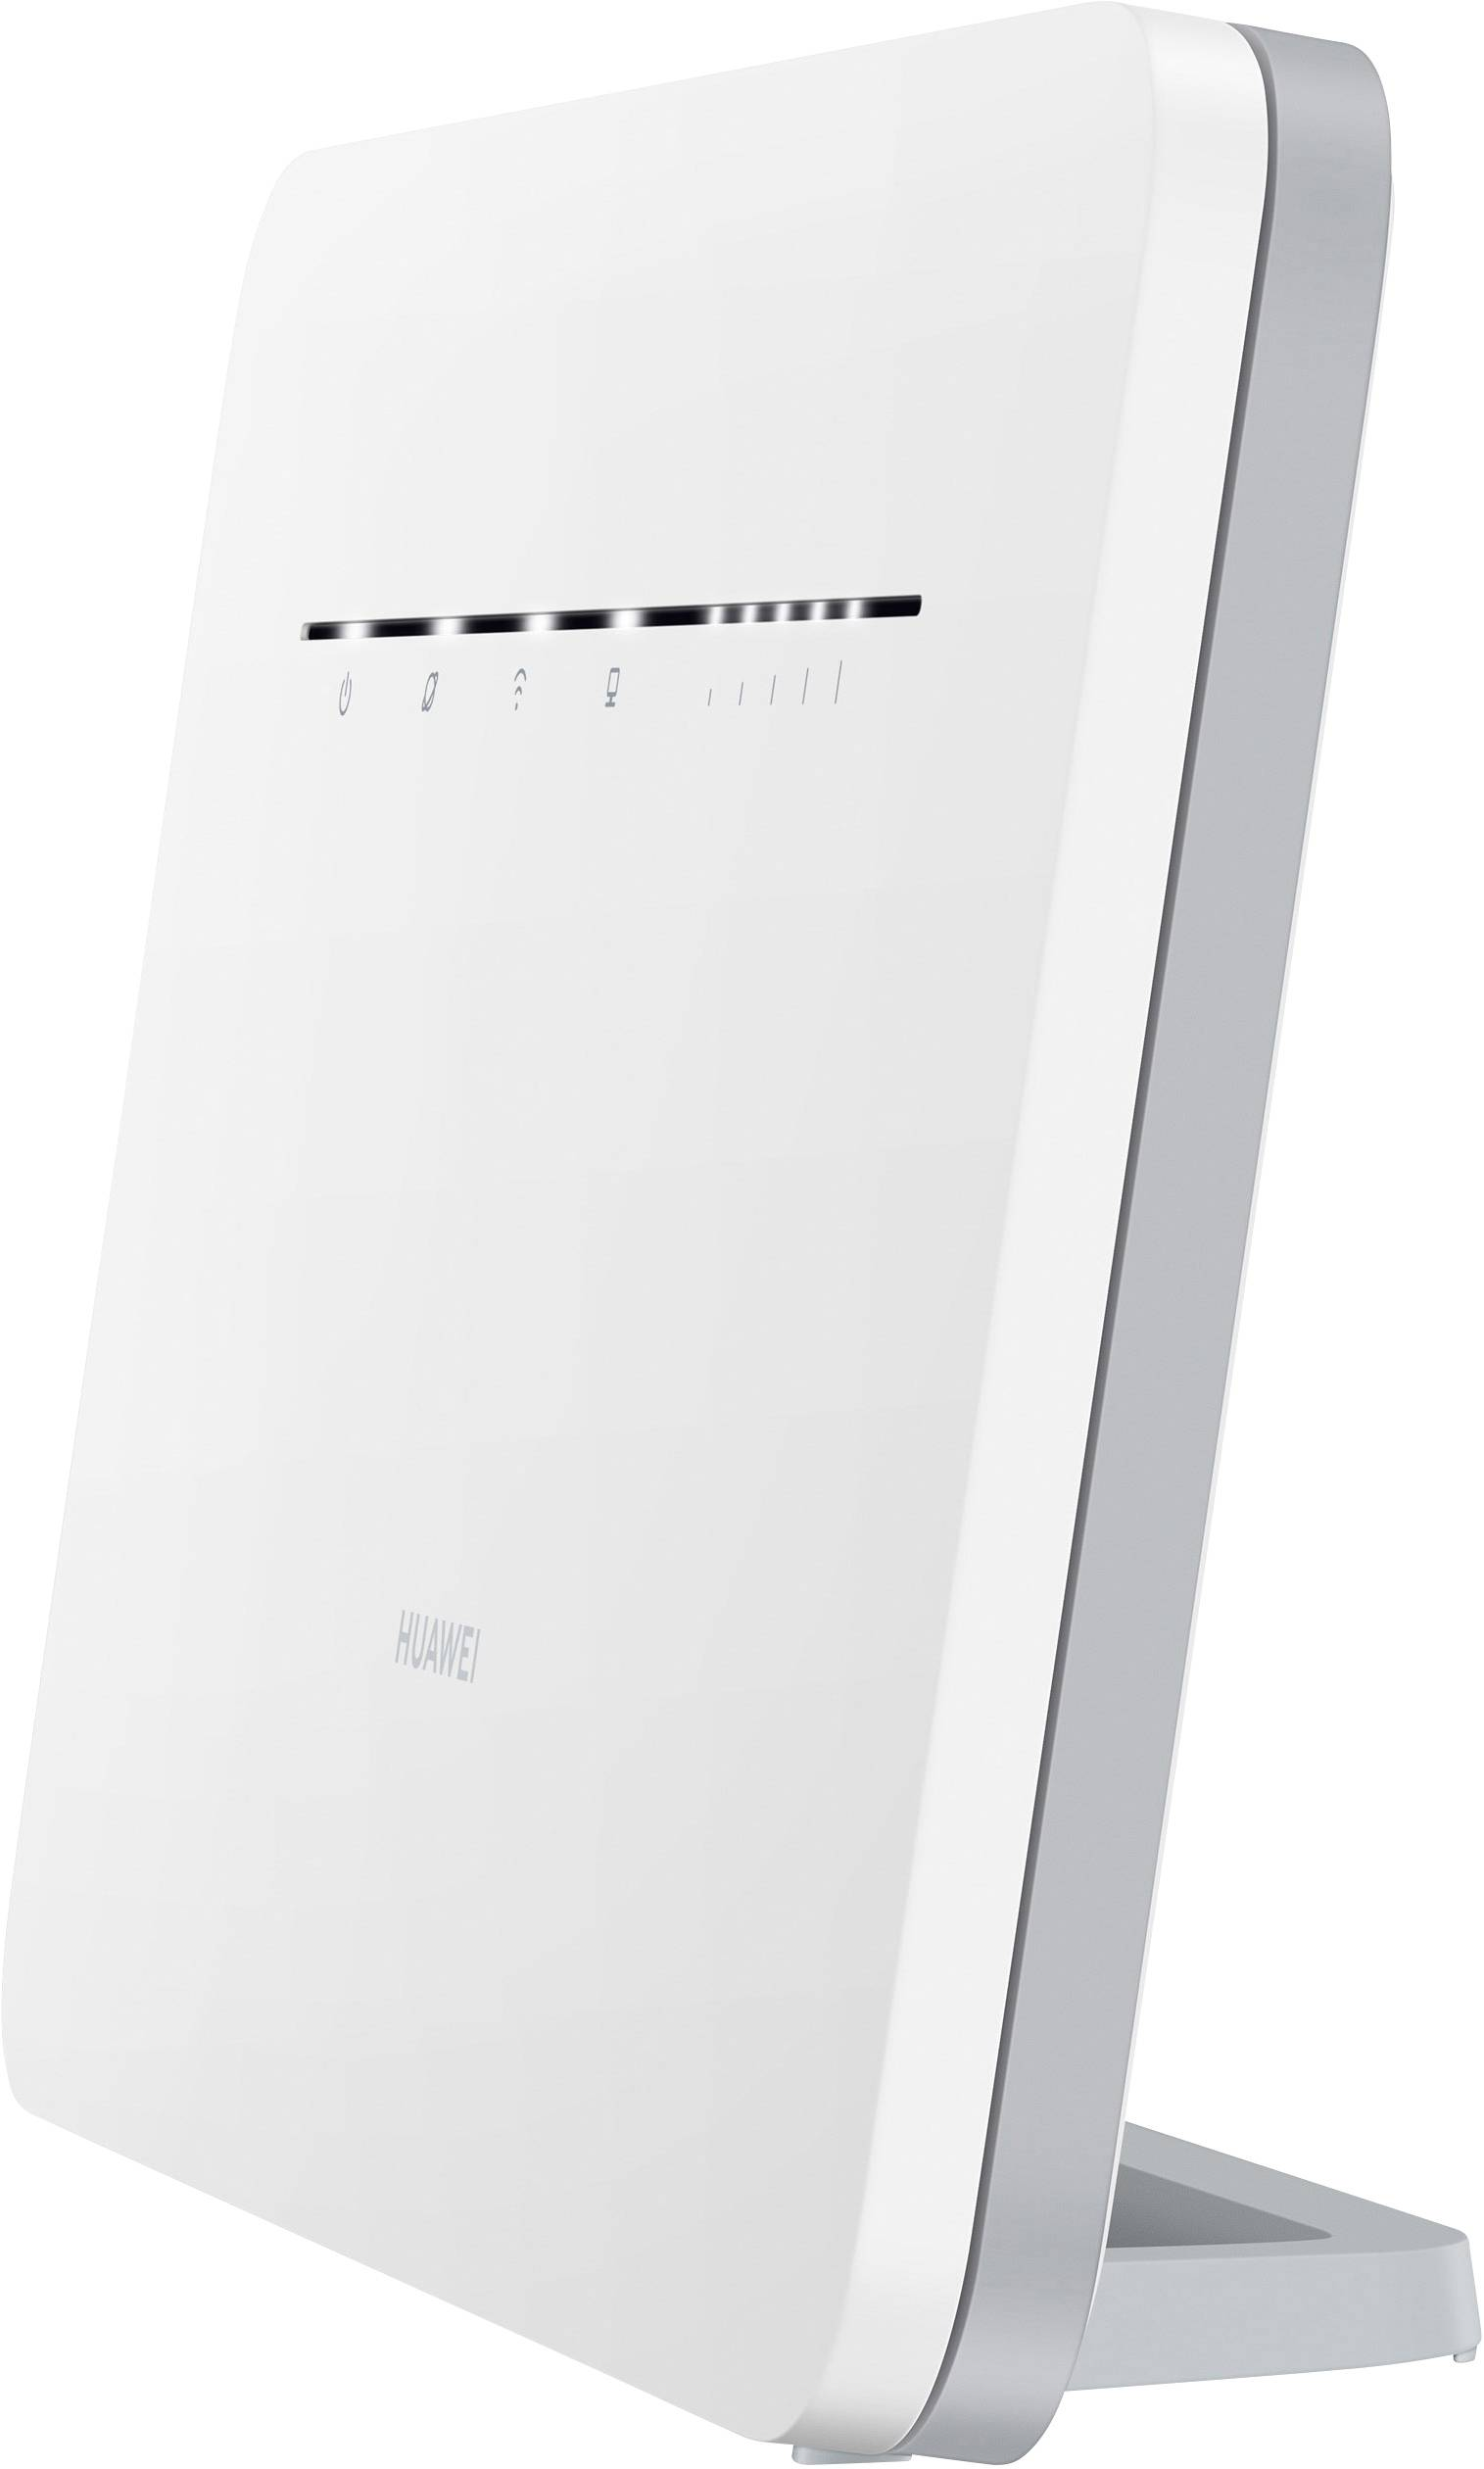 Huawei B535 232 Wi Fi Modem Router Built In Modem Lte Umts 2 4 Ghz 5 Ghz Conrad Com